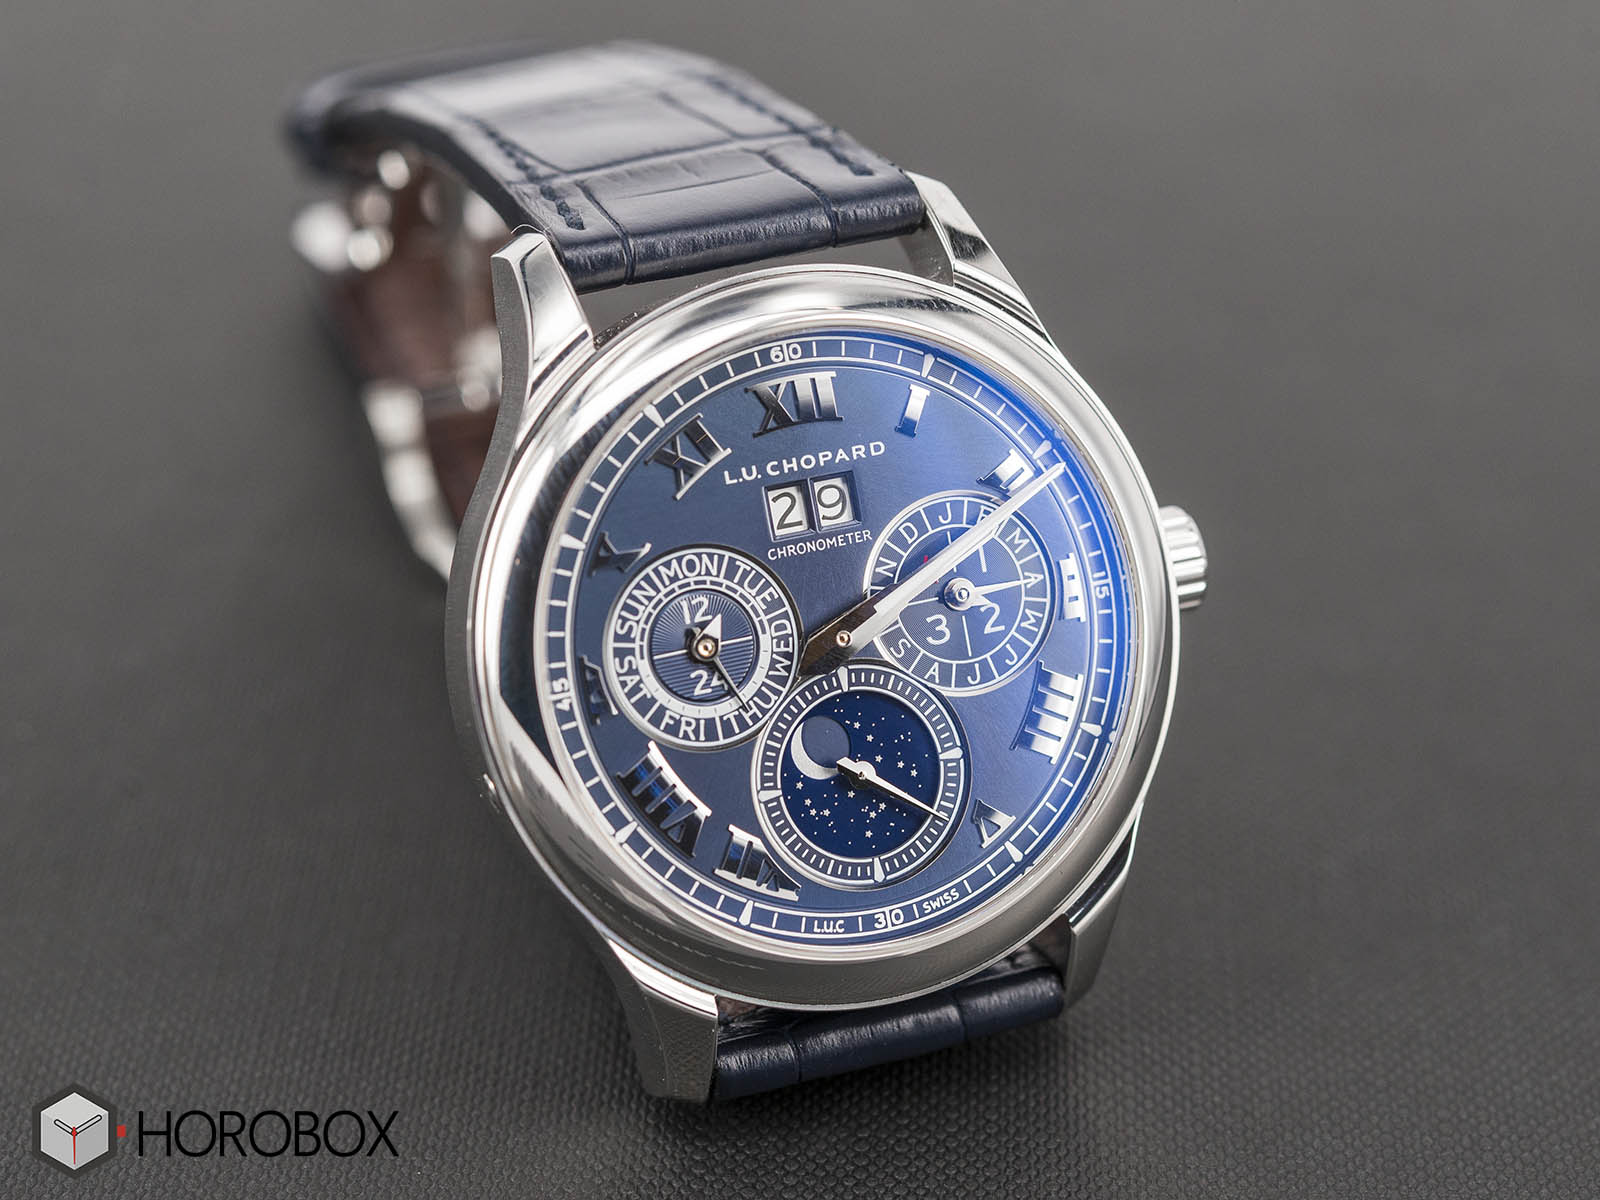 Chopard-L-U-C-Lunar-One-Platinum-Royal-Blue-perpetual-calendar-1-.jpg